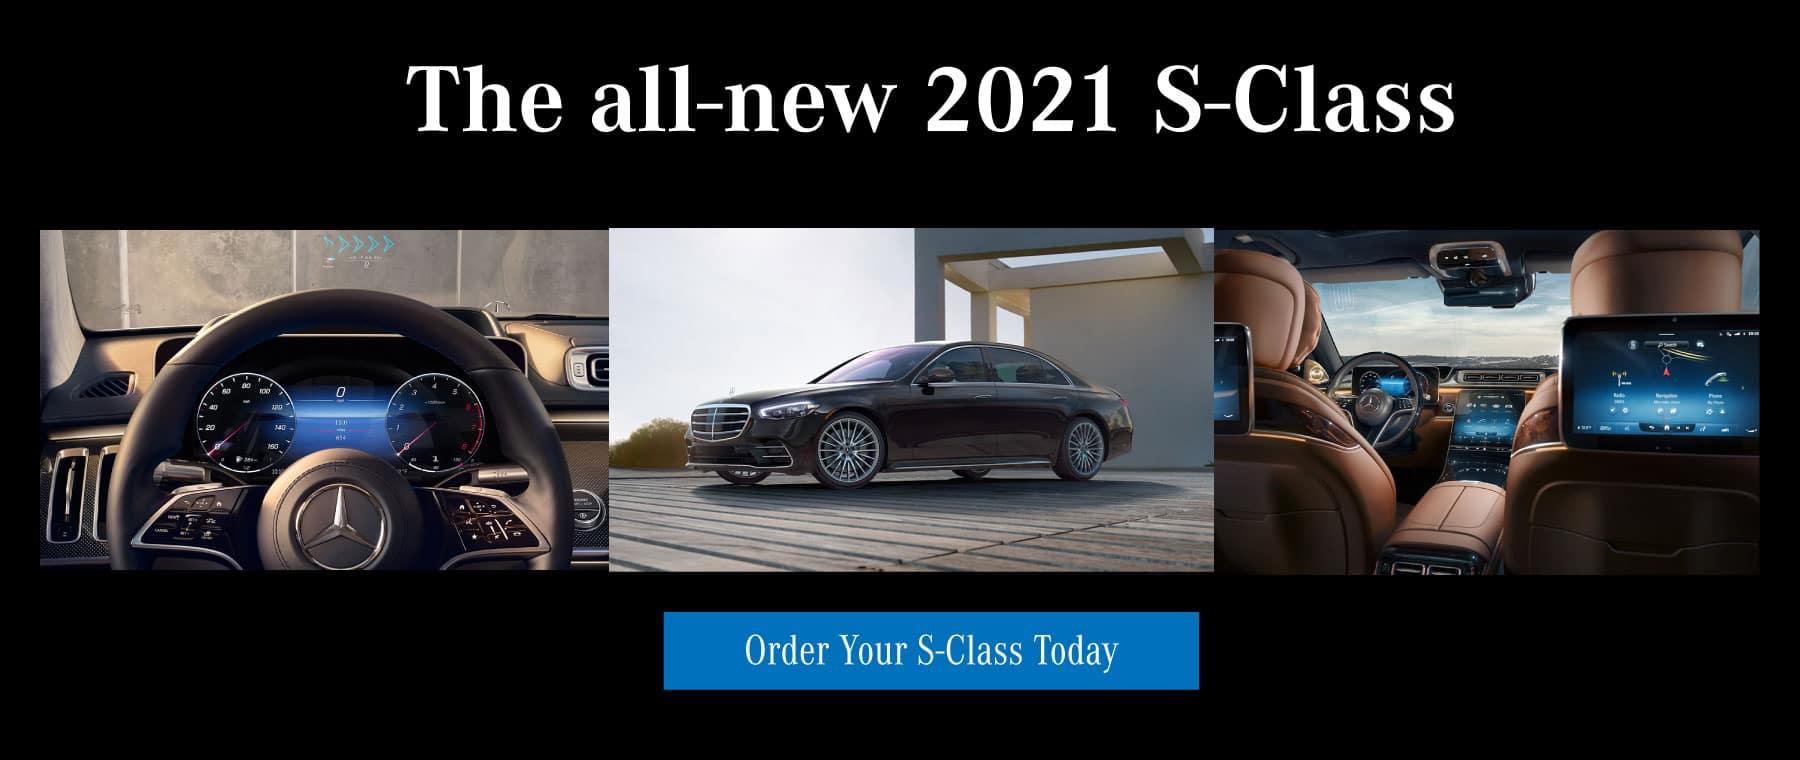 Mercedes-Benz of North scottsdale 2021 s-class sedan